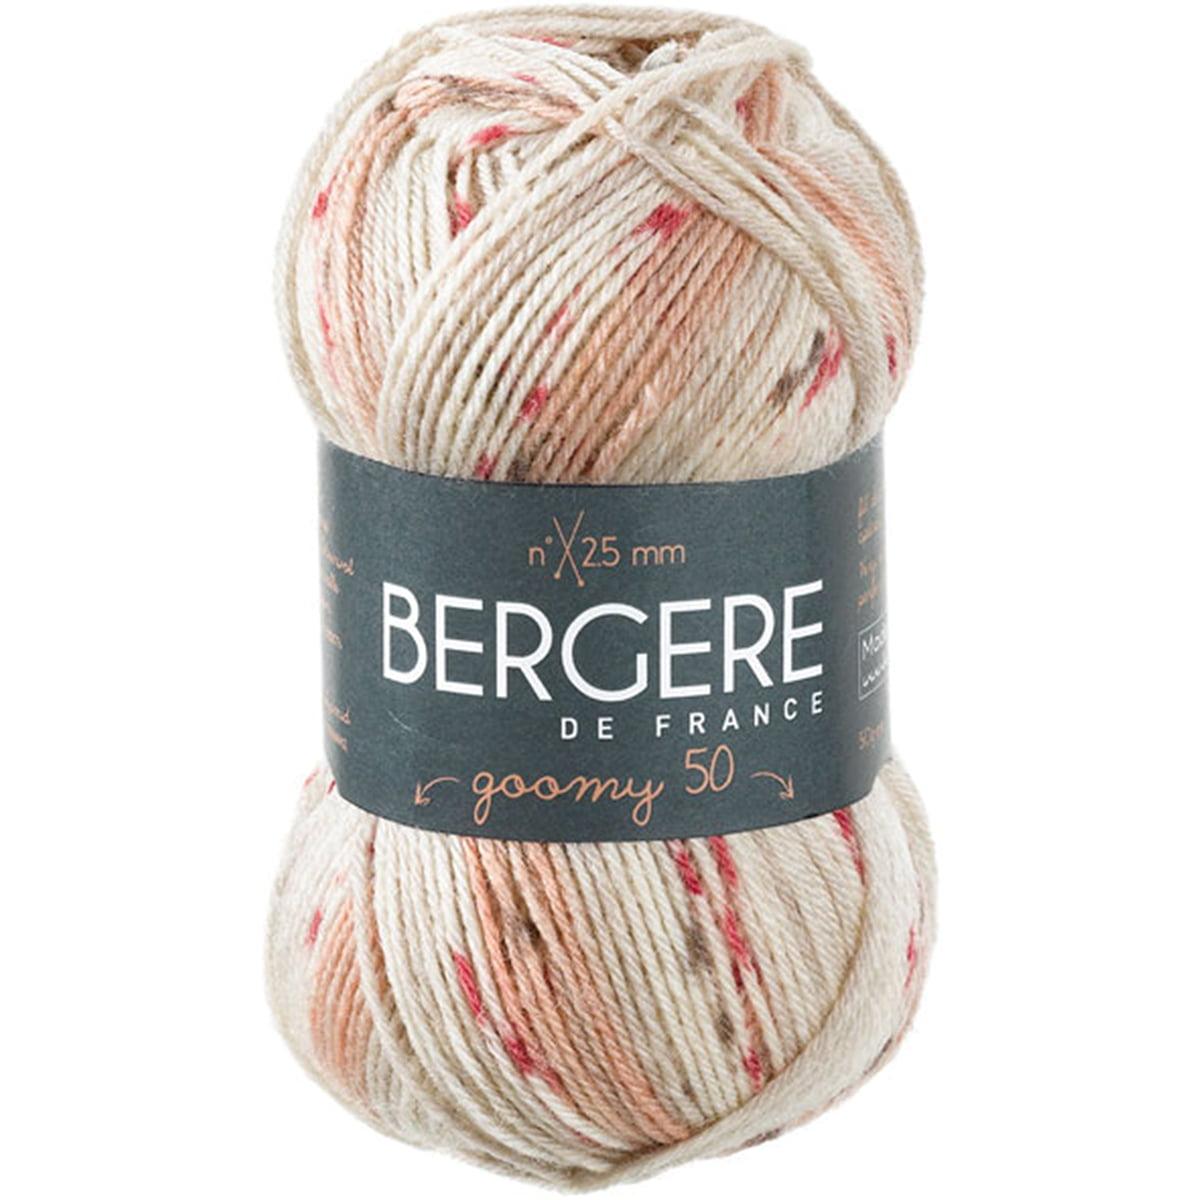 Bergere De France Goomy Yarn-Imprim Beige